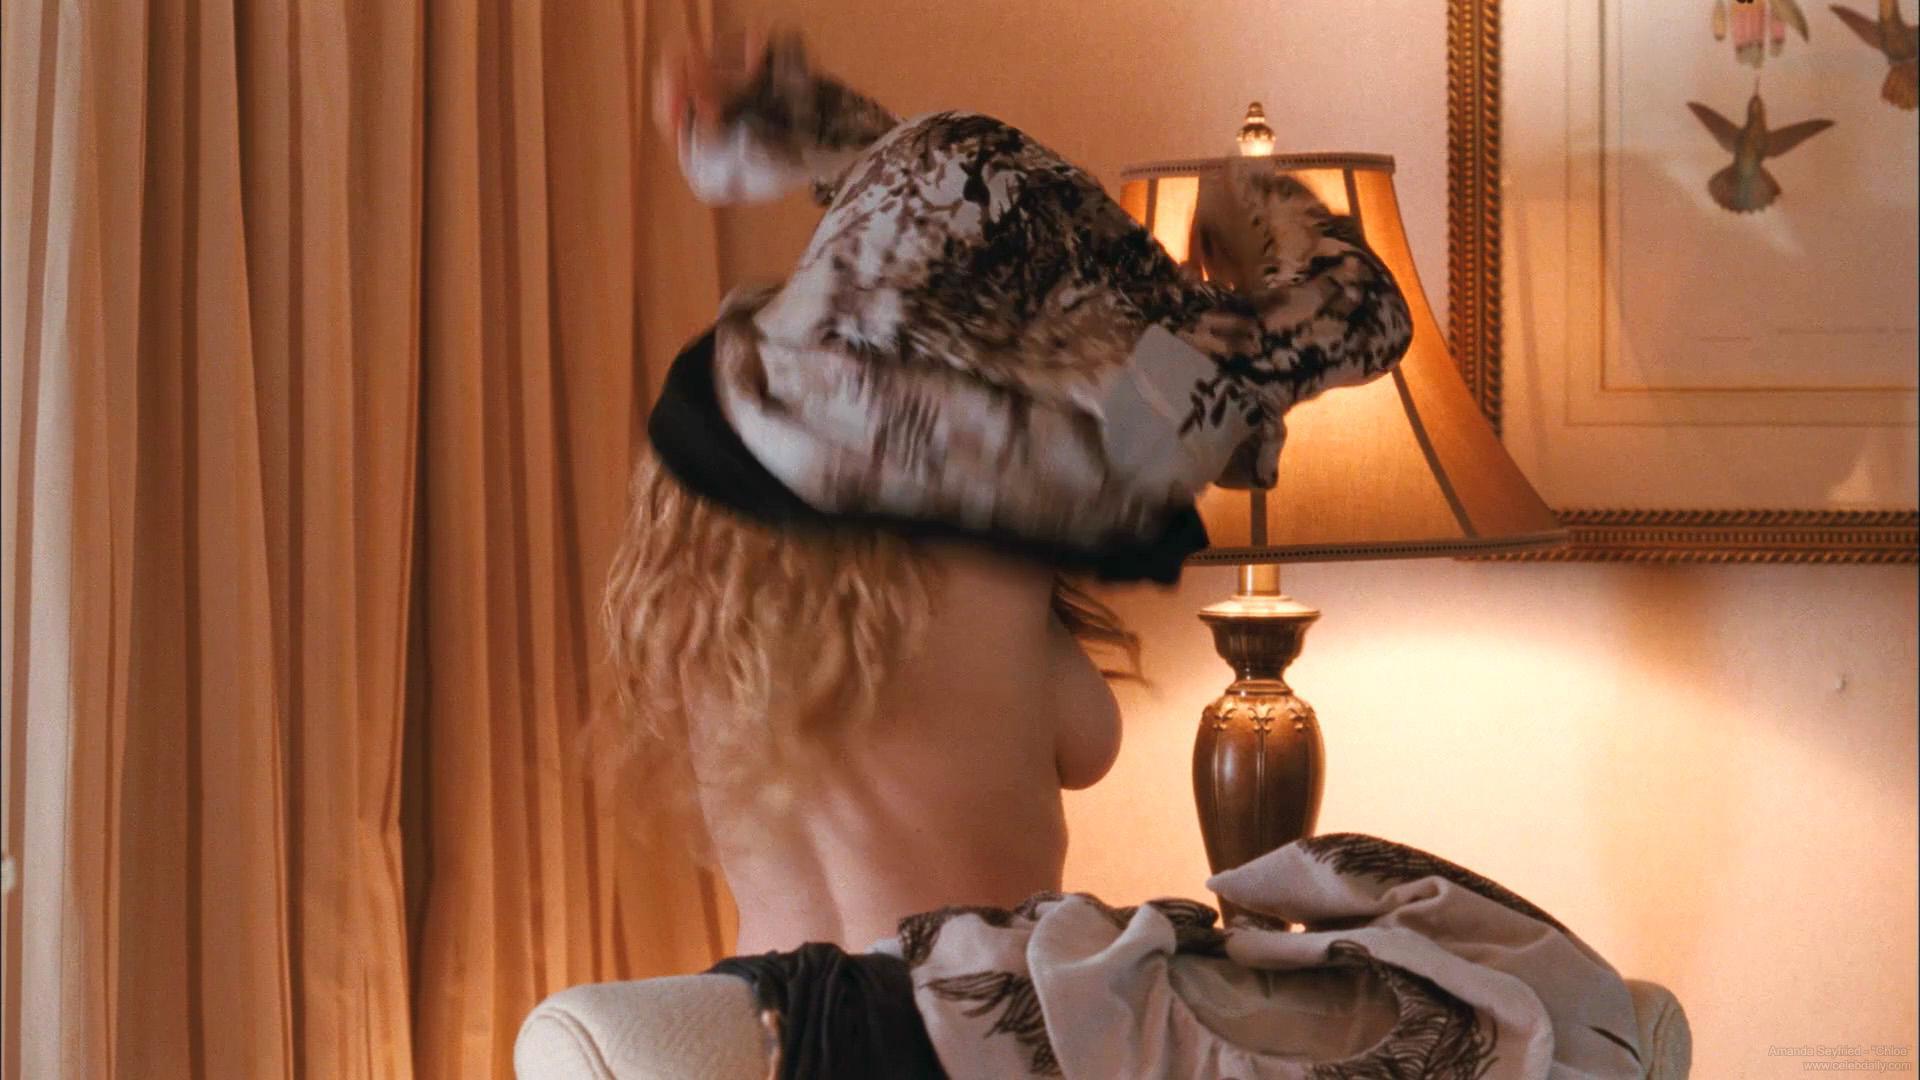 Amanda seyfried showing big boobs riding